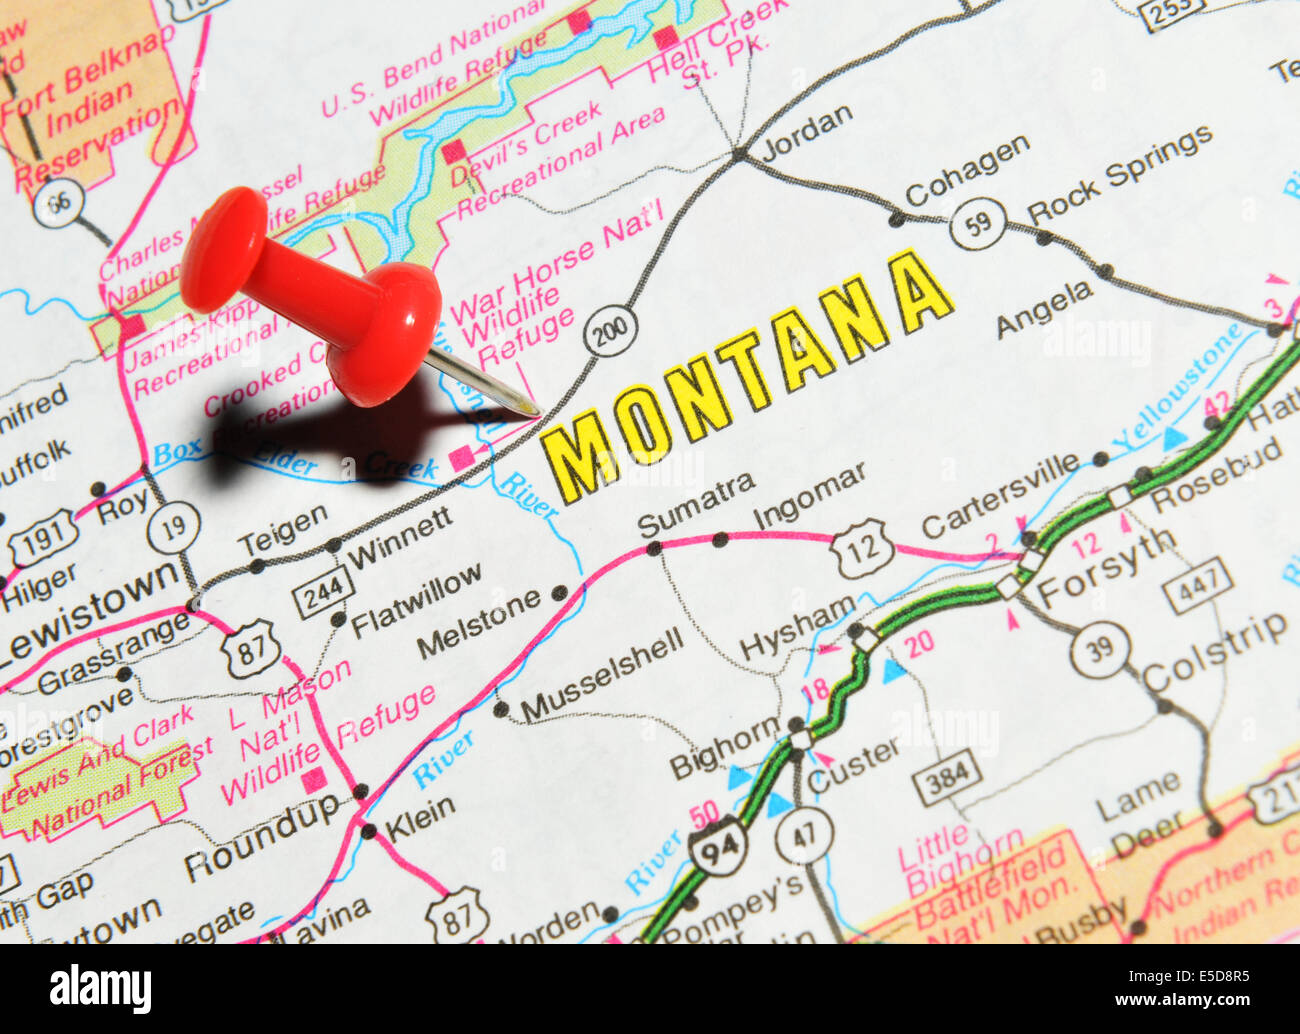 Montana On Us Map Stock Photo 72207049 Alamy